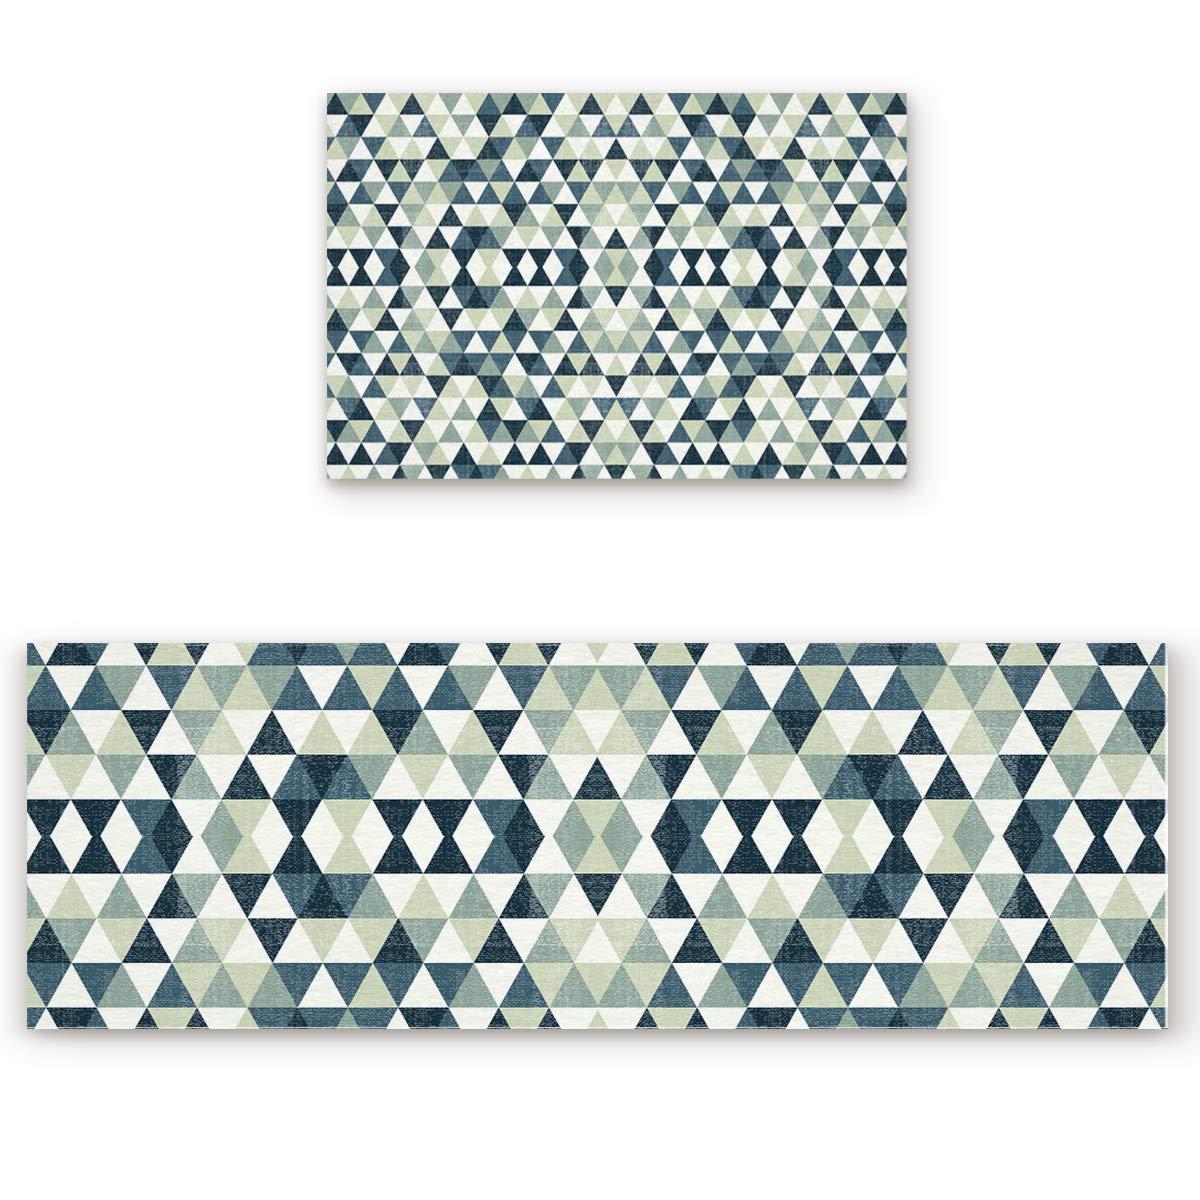 Northern Europe 5san3922 19.7\ Savannan 2 Piece Non-Slip Kitchen Bathroom Entrance Mat Absorbent Durable Floor Doormat Runner Rug Set - Geometric Pattern